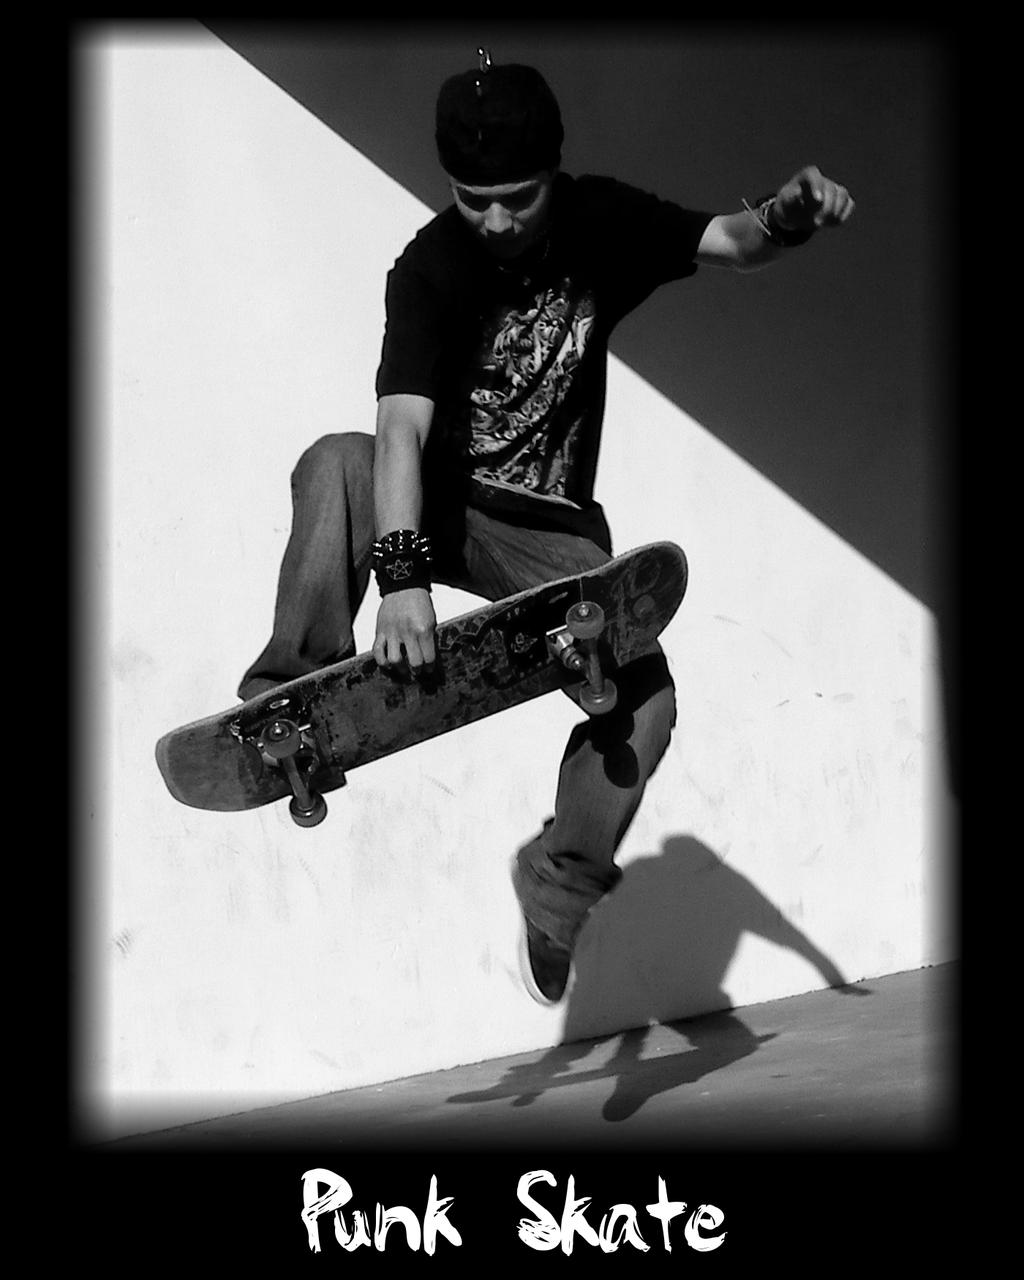 Skate Punk by mtcovik